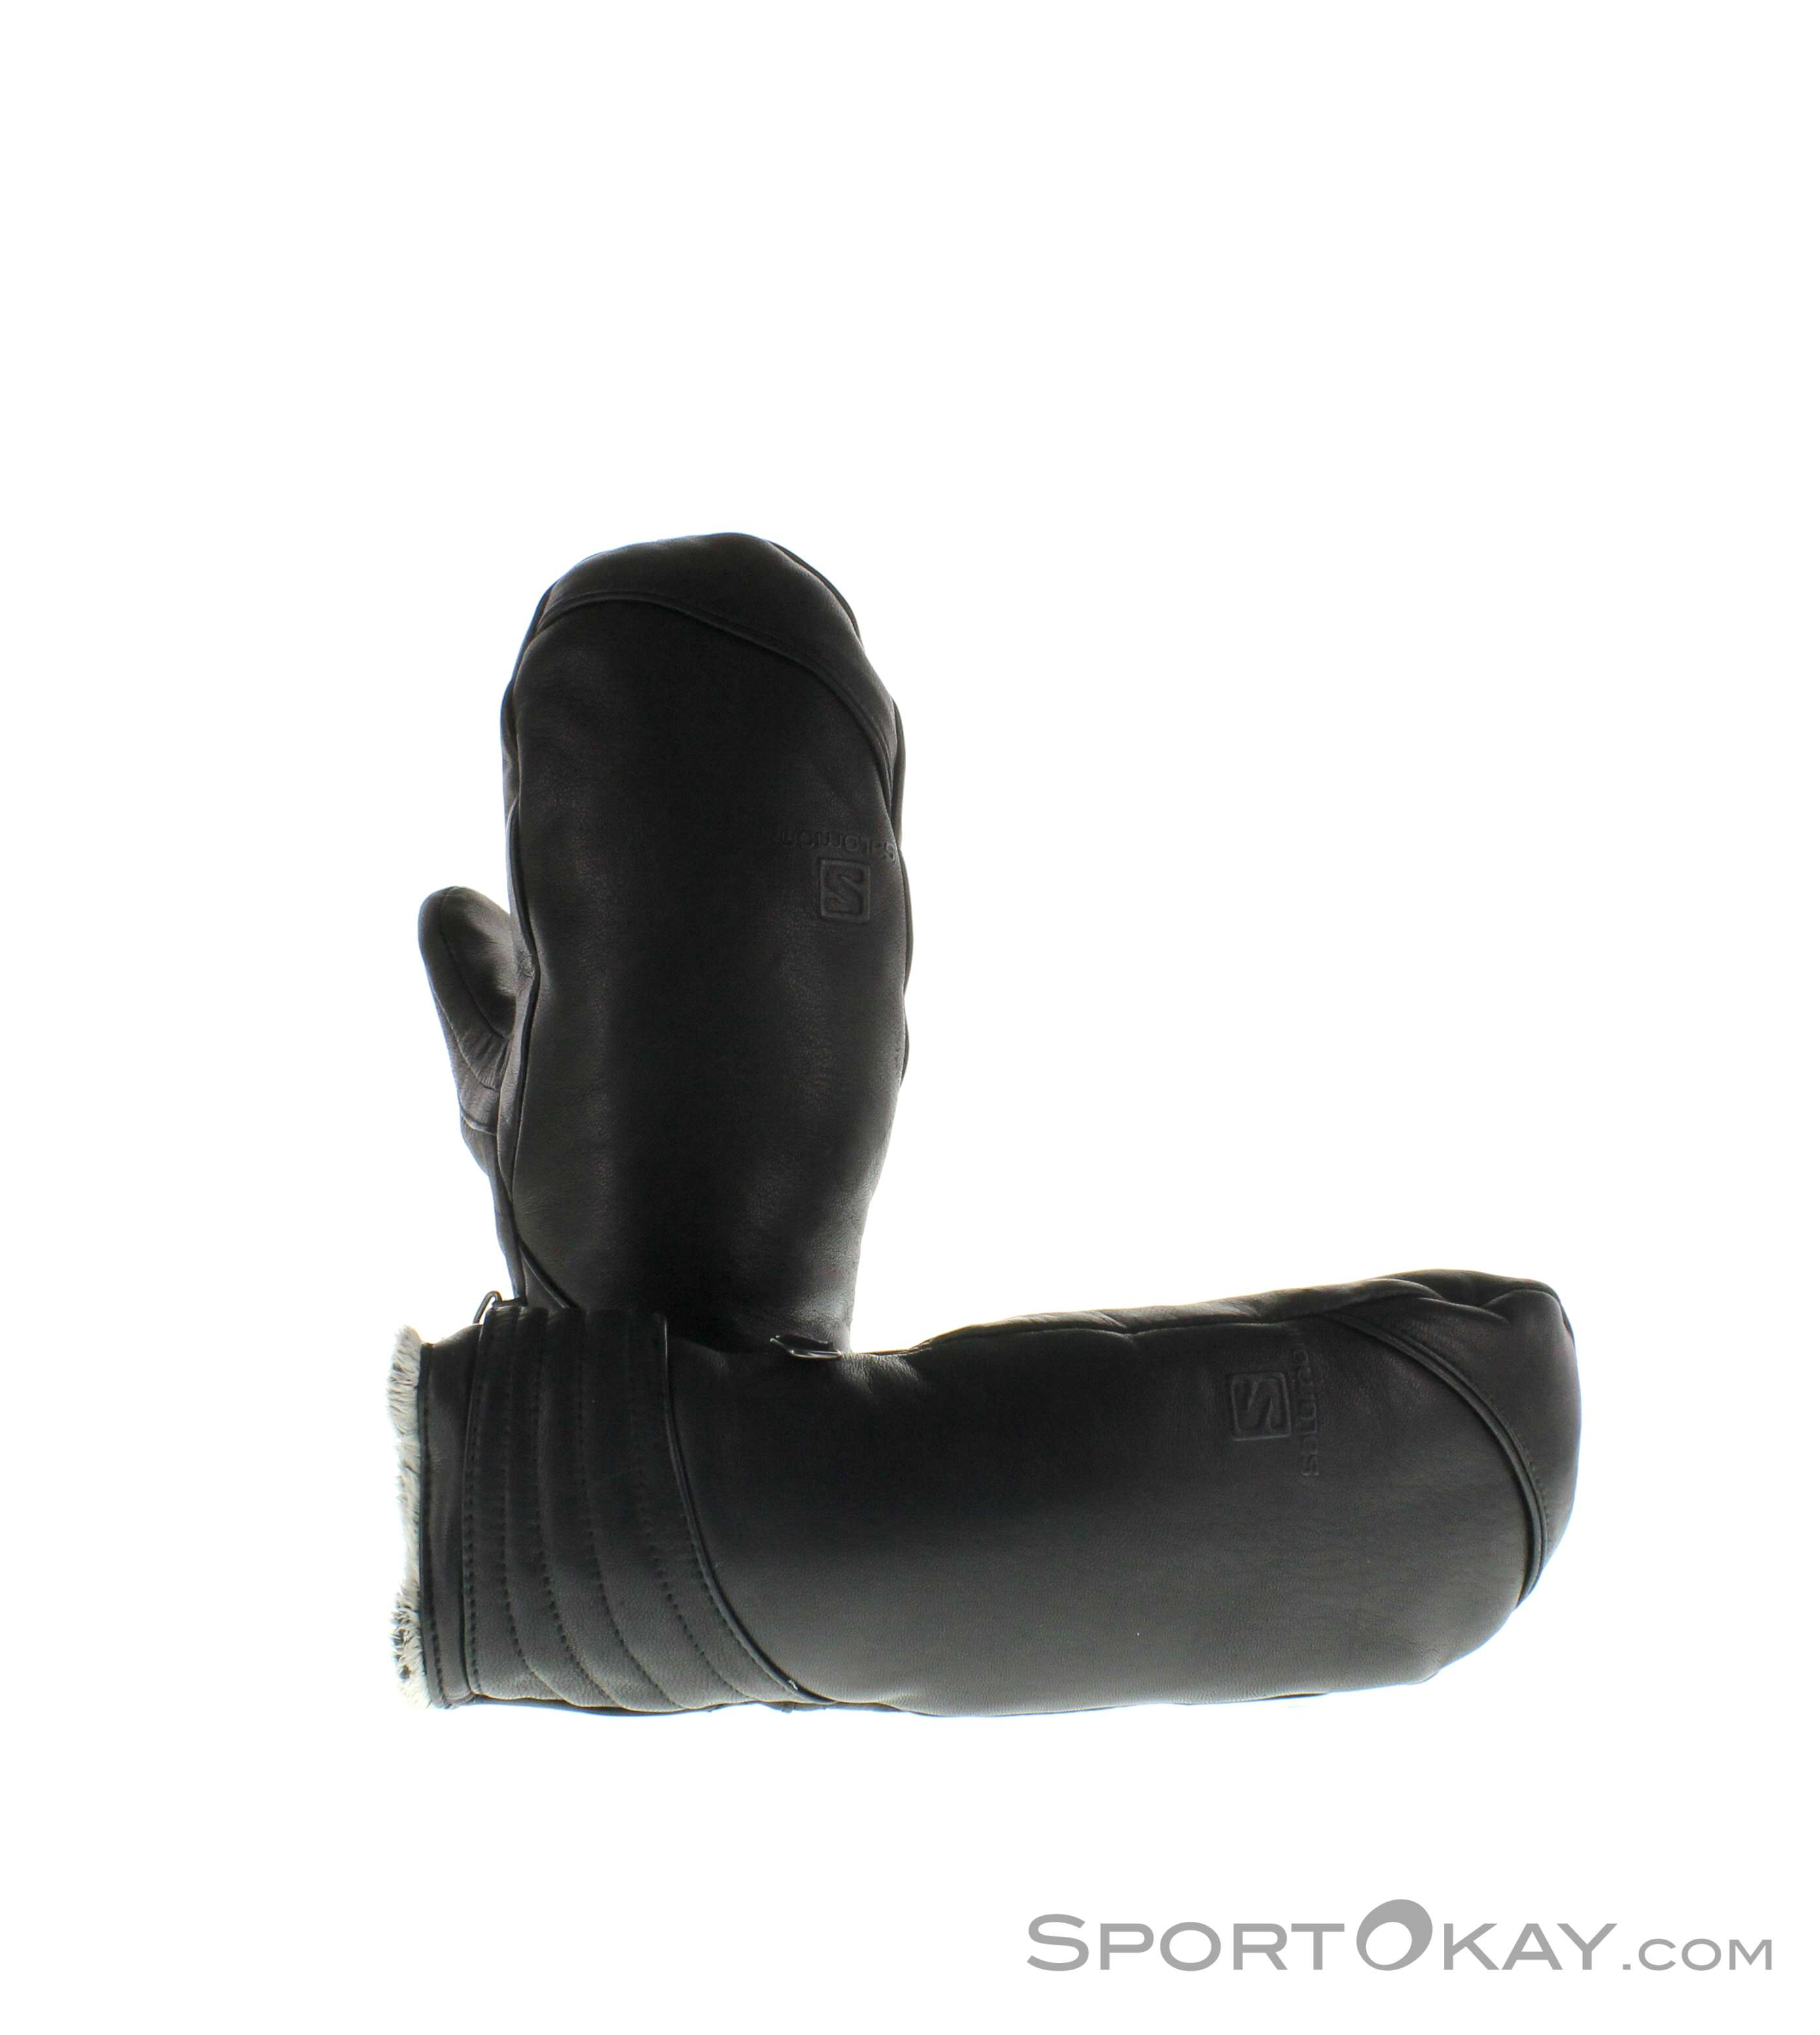 Salomon Native Mitten Damen Handschuhe-Schwarz-L